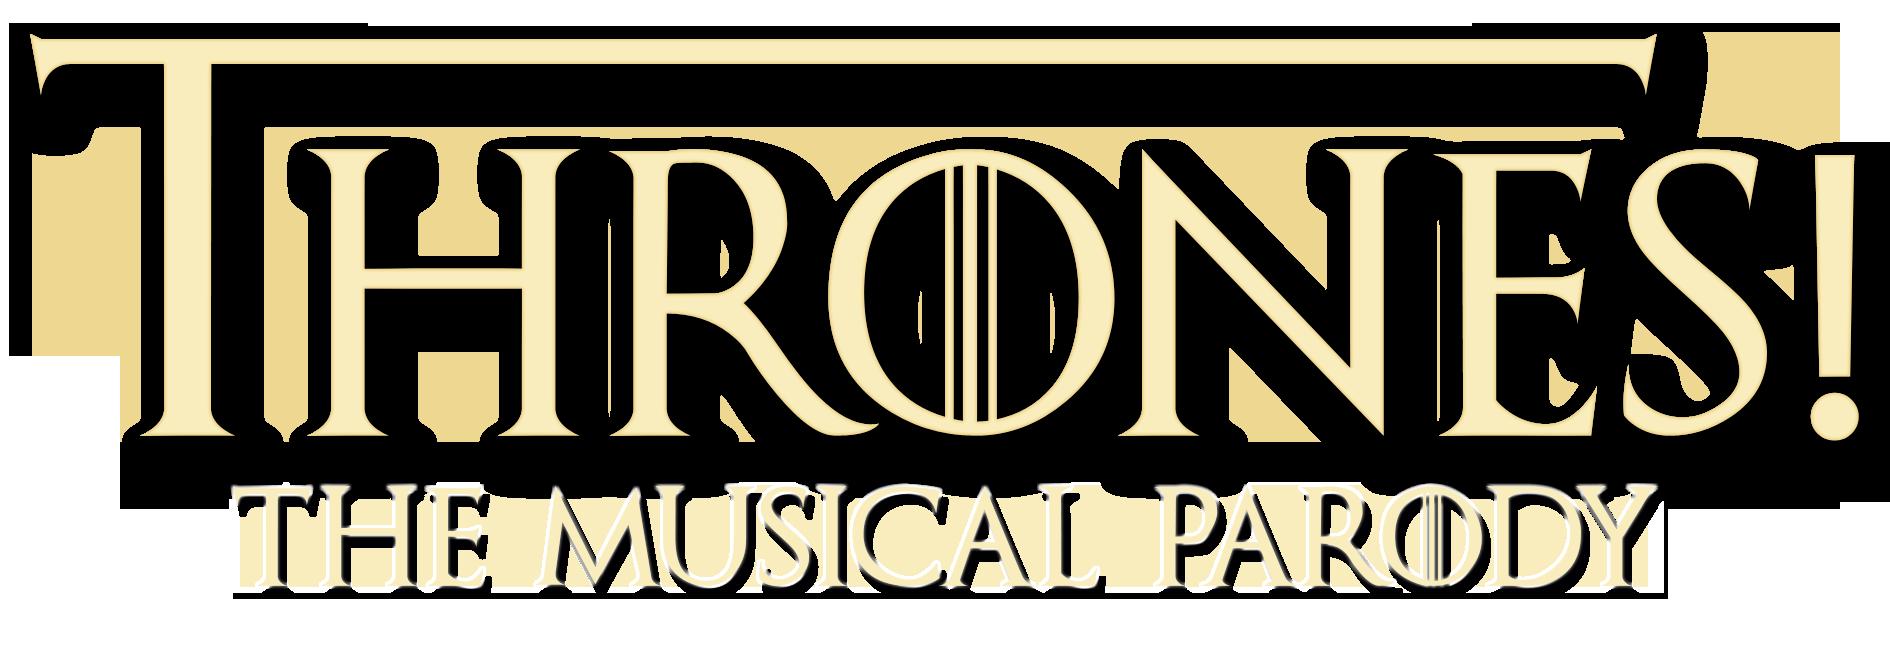 THRONES_logo_solo_1.0-2.png